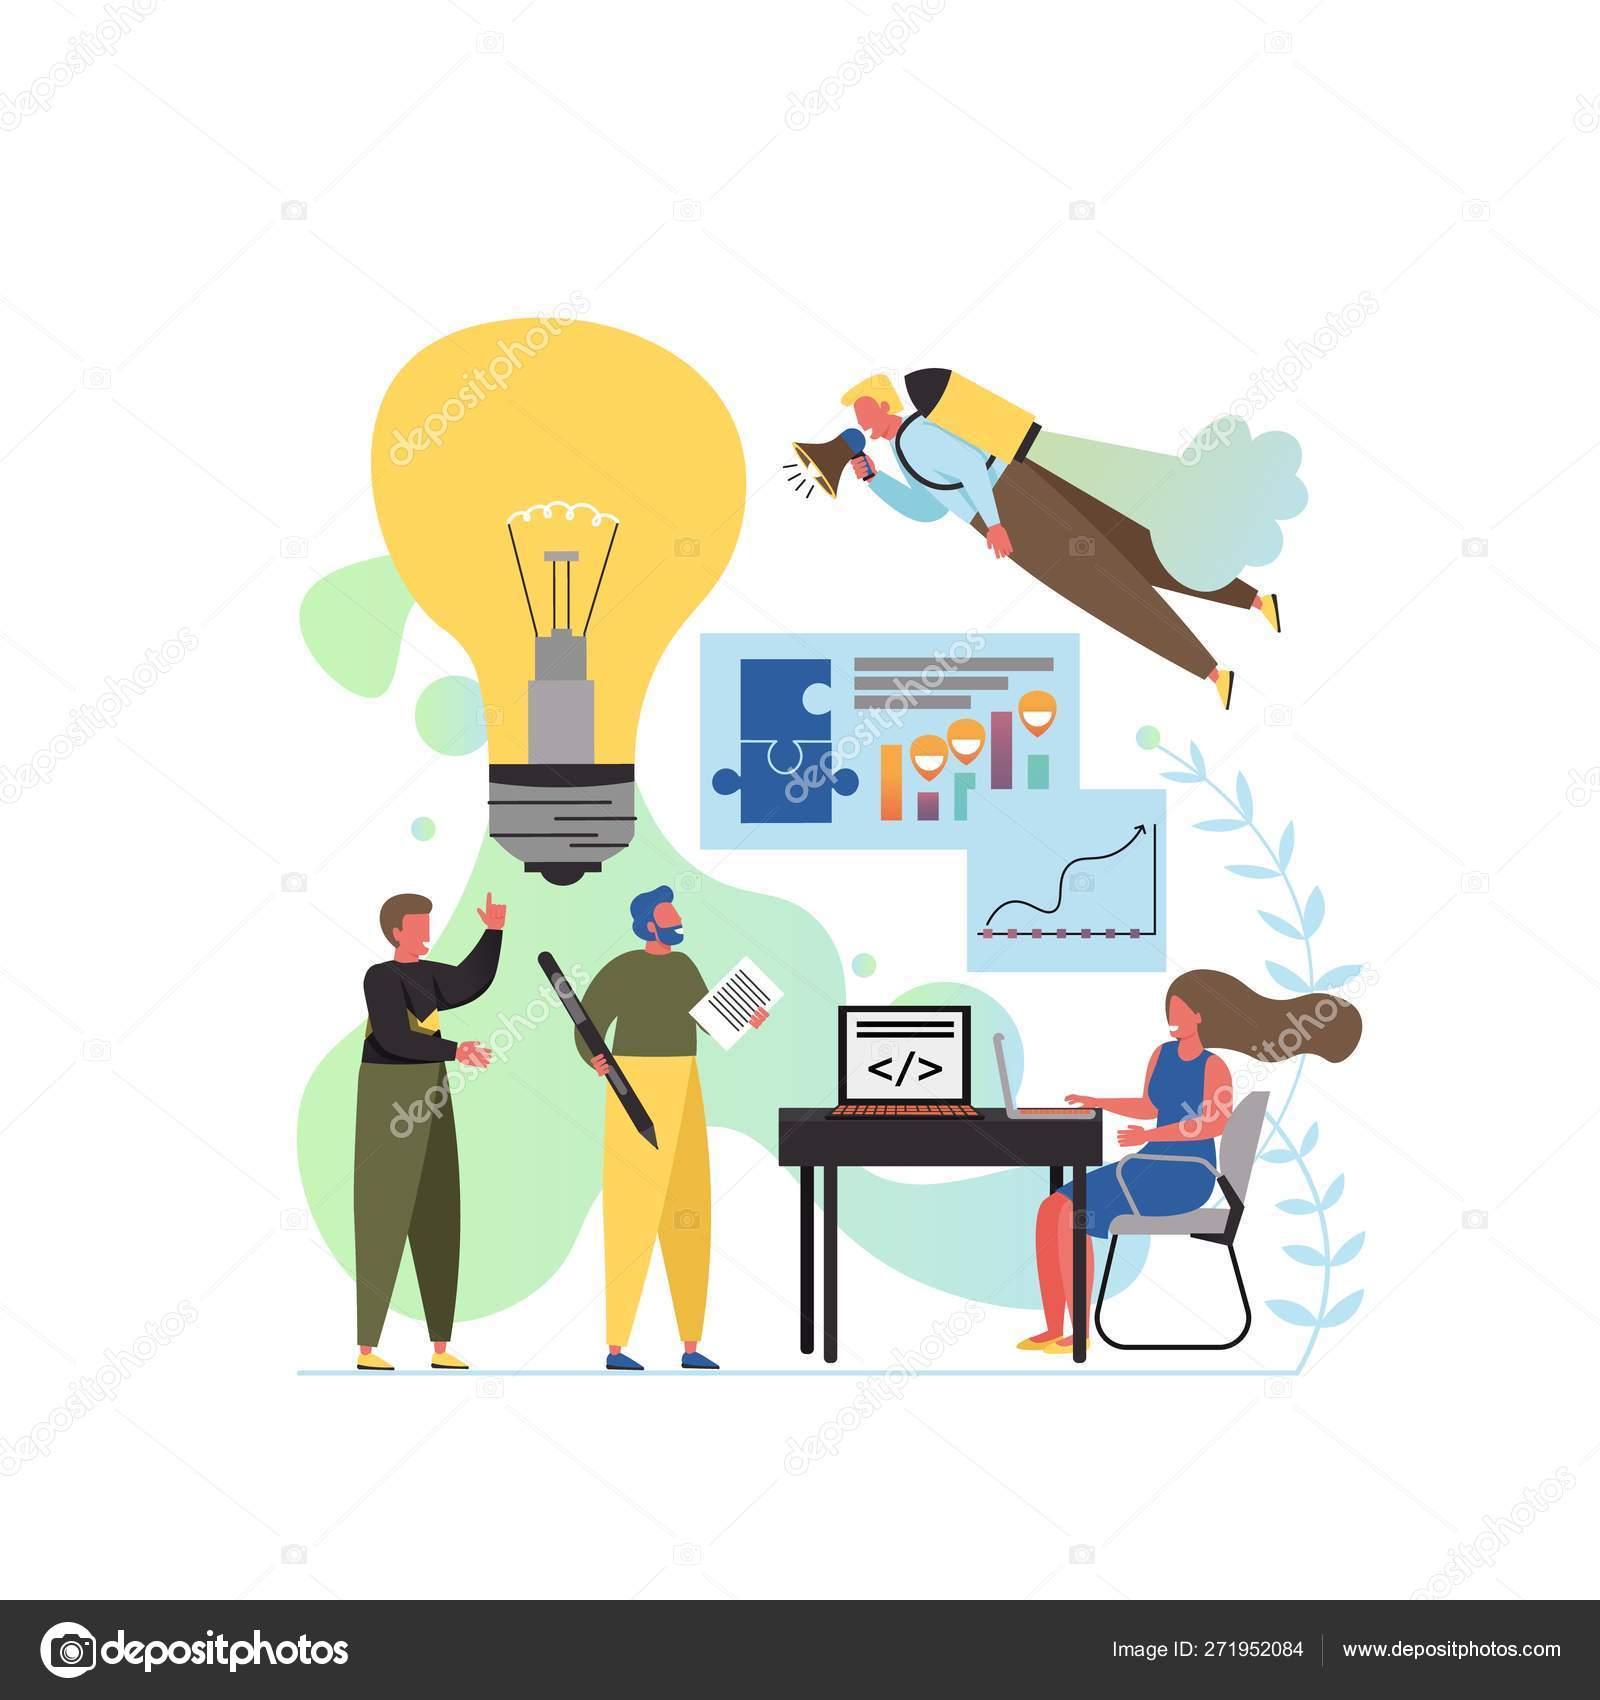 digital marketing vector flat style design illustration stock vector c skypistudio 271952084 digital marketing vector flat style design illustration stock vector c skypistudio 271952084